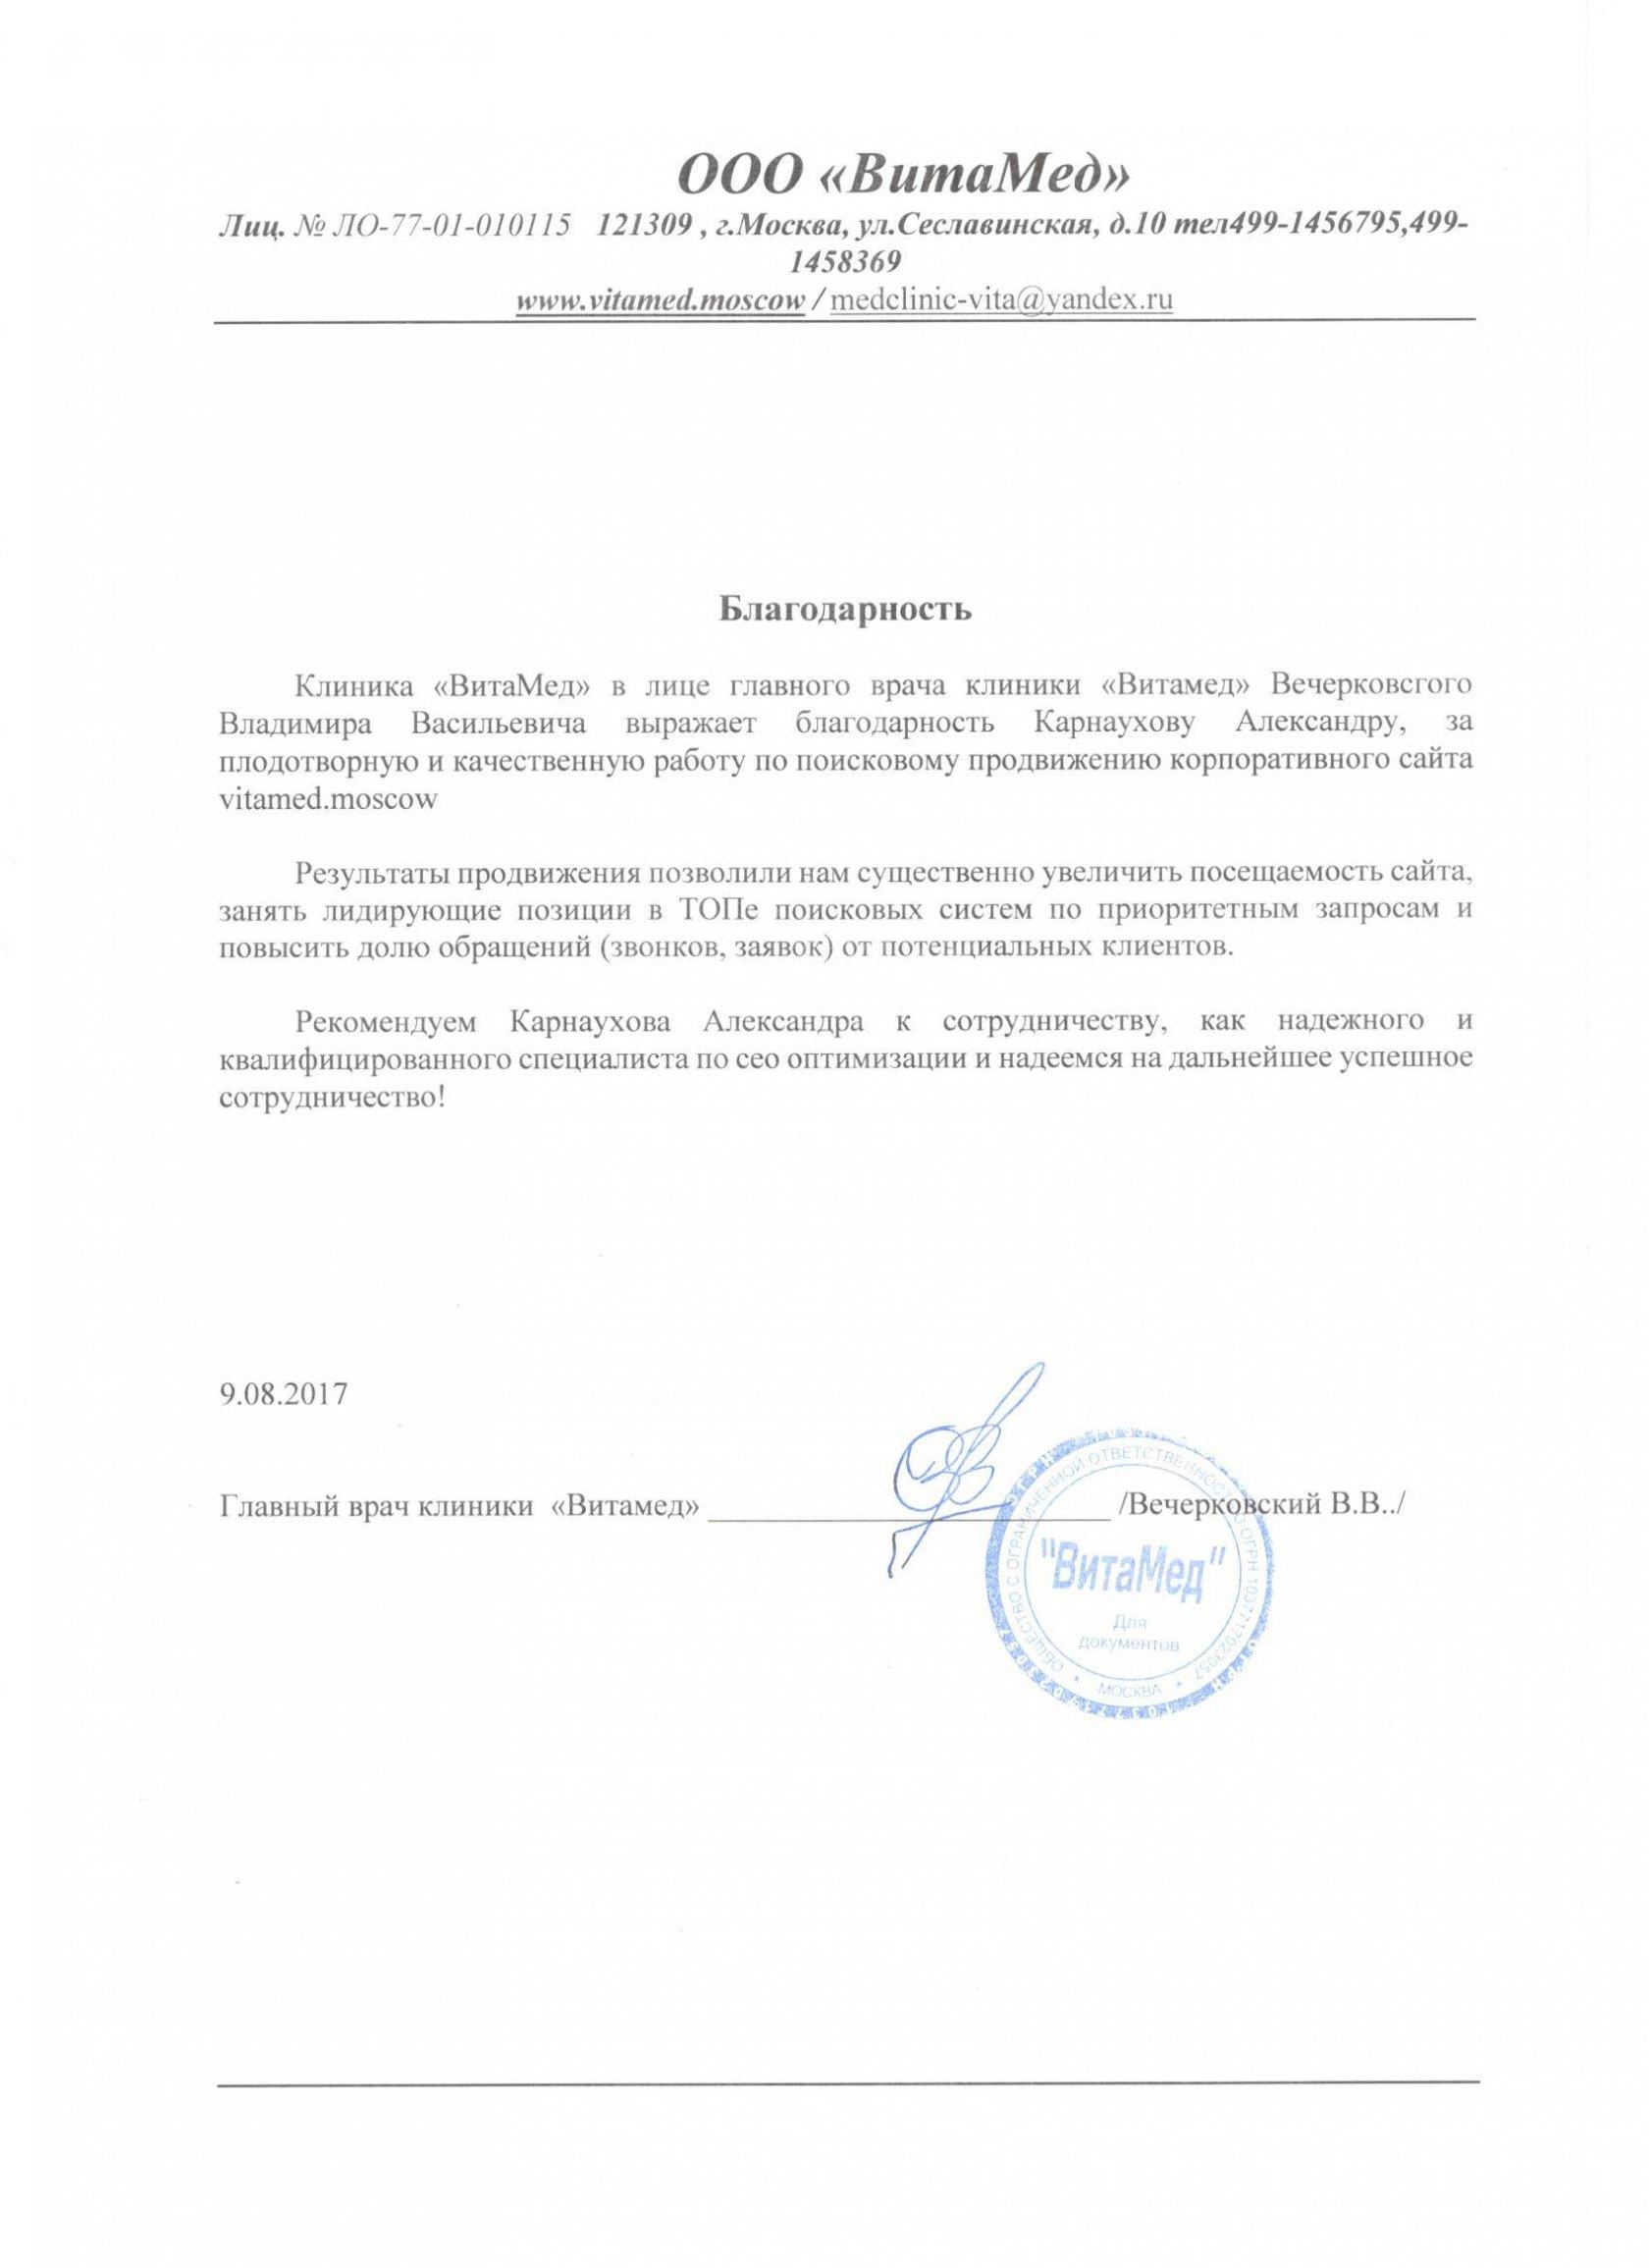 "Благодарственное письмо от ""ВитаМед"" за продвижение сайта vitamed.moscow"